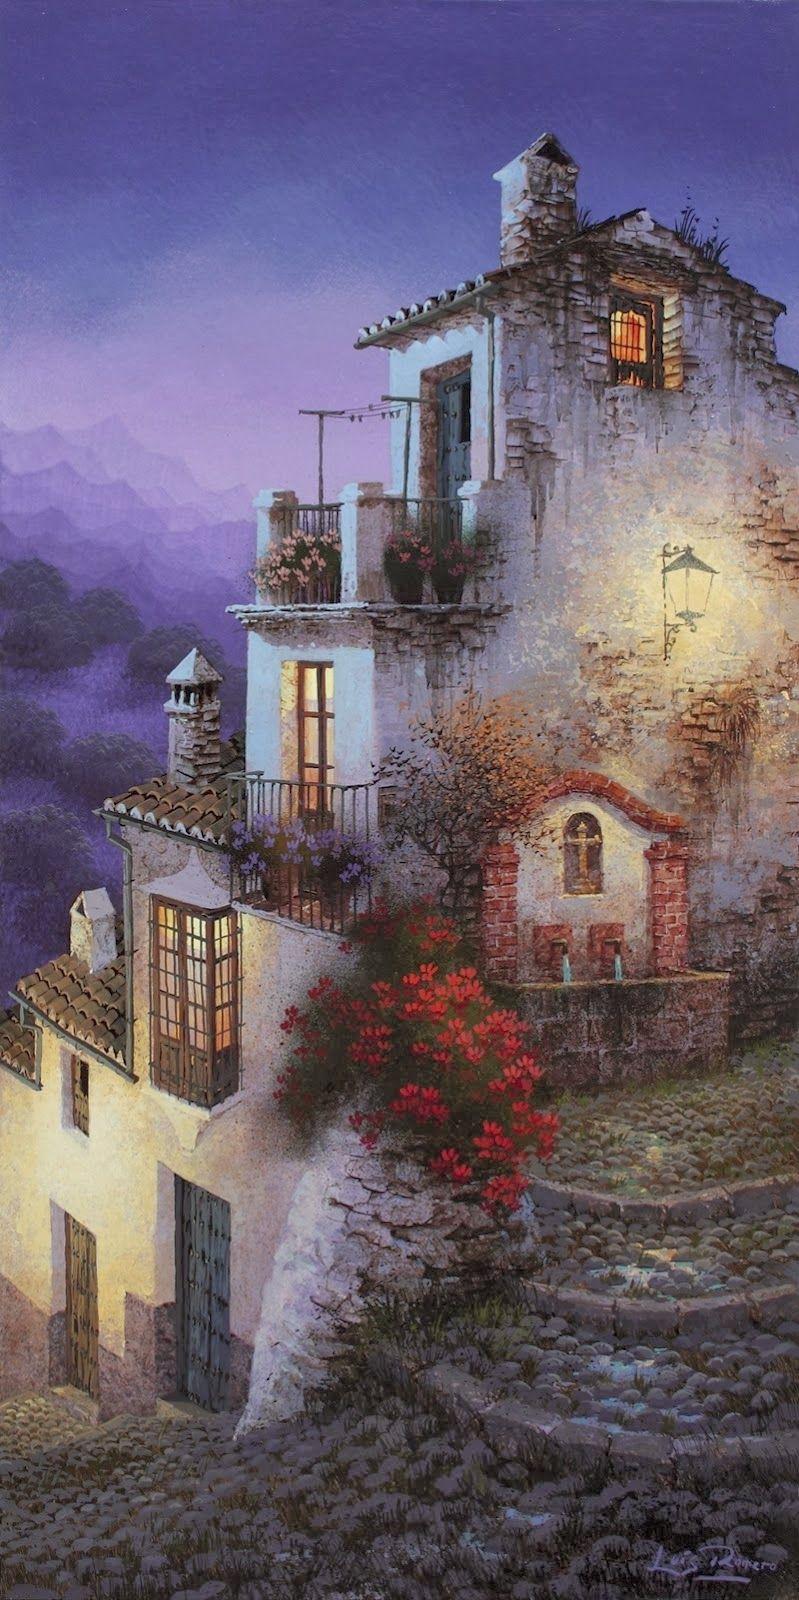 Luis+Romero+-+Spanish+Spray+Painter%40fineartandyou1.jpg 799×1.600 piksel